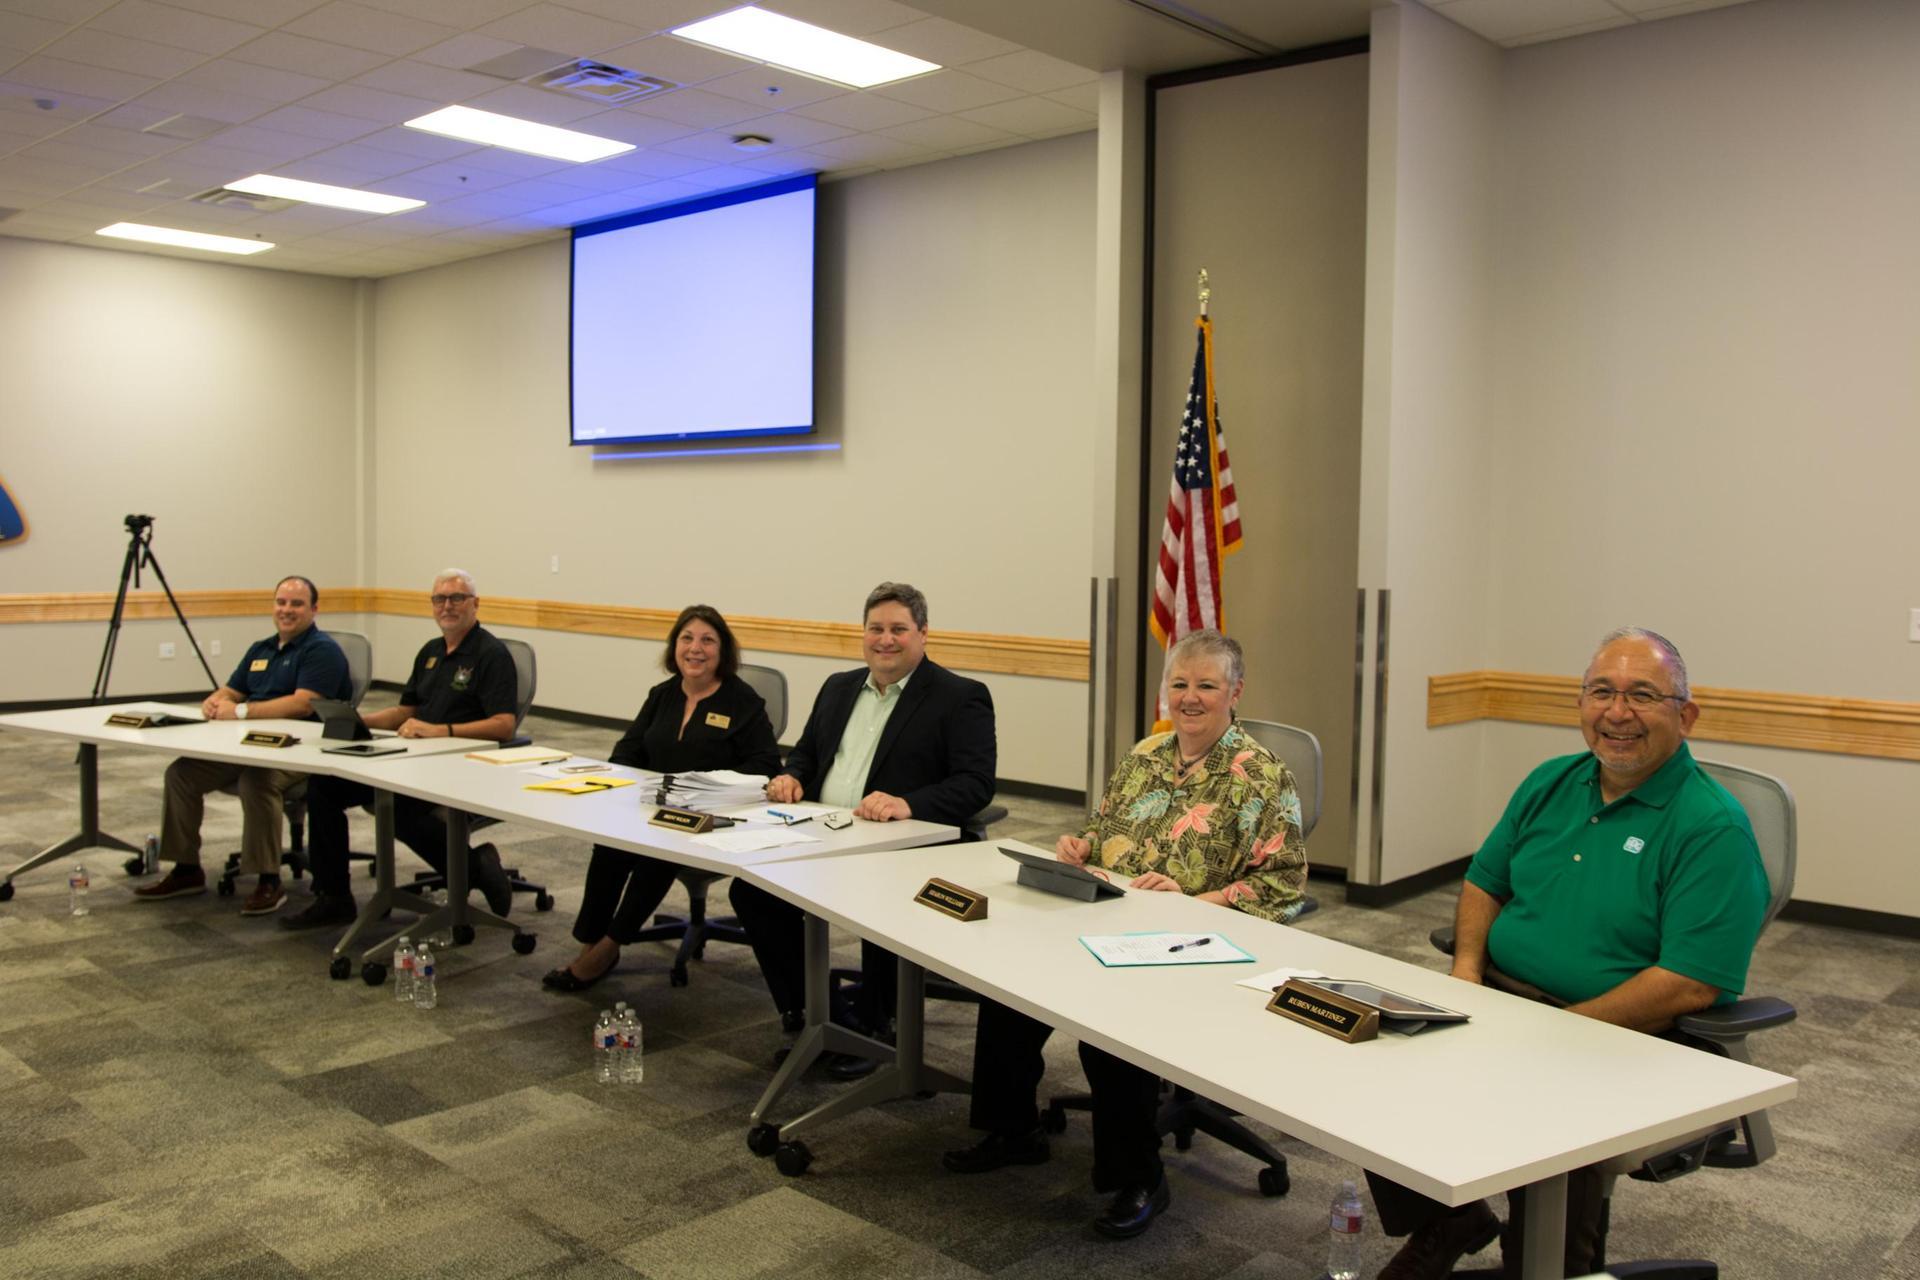 2018 Board Meeting